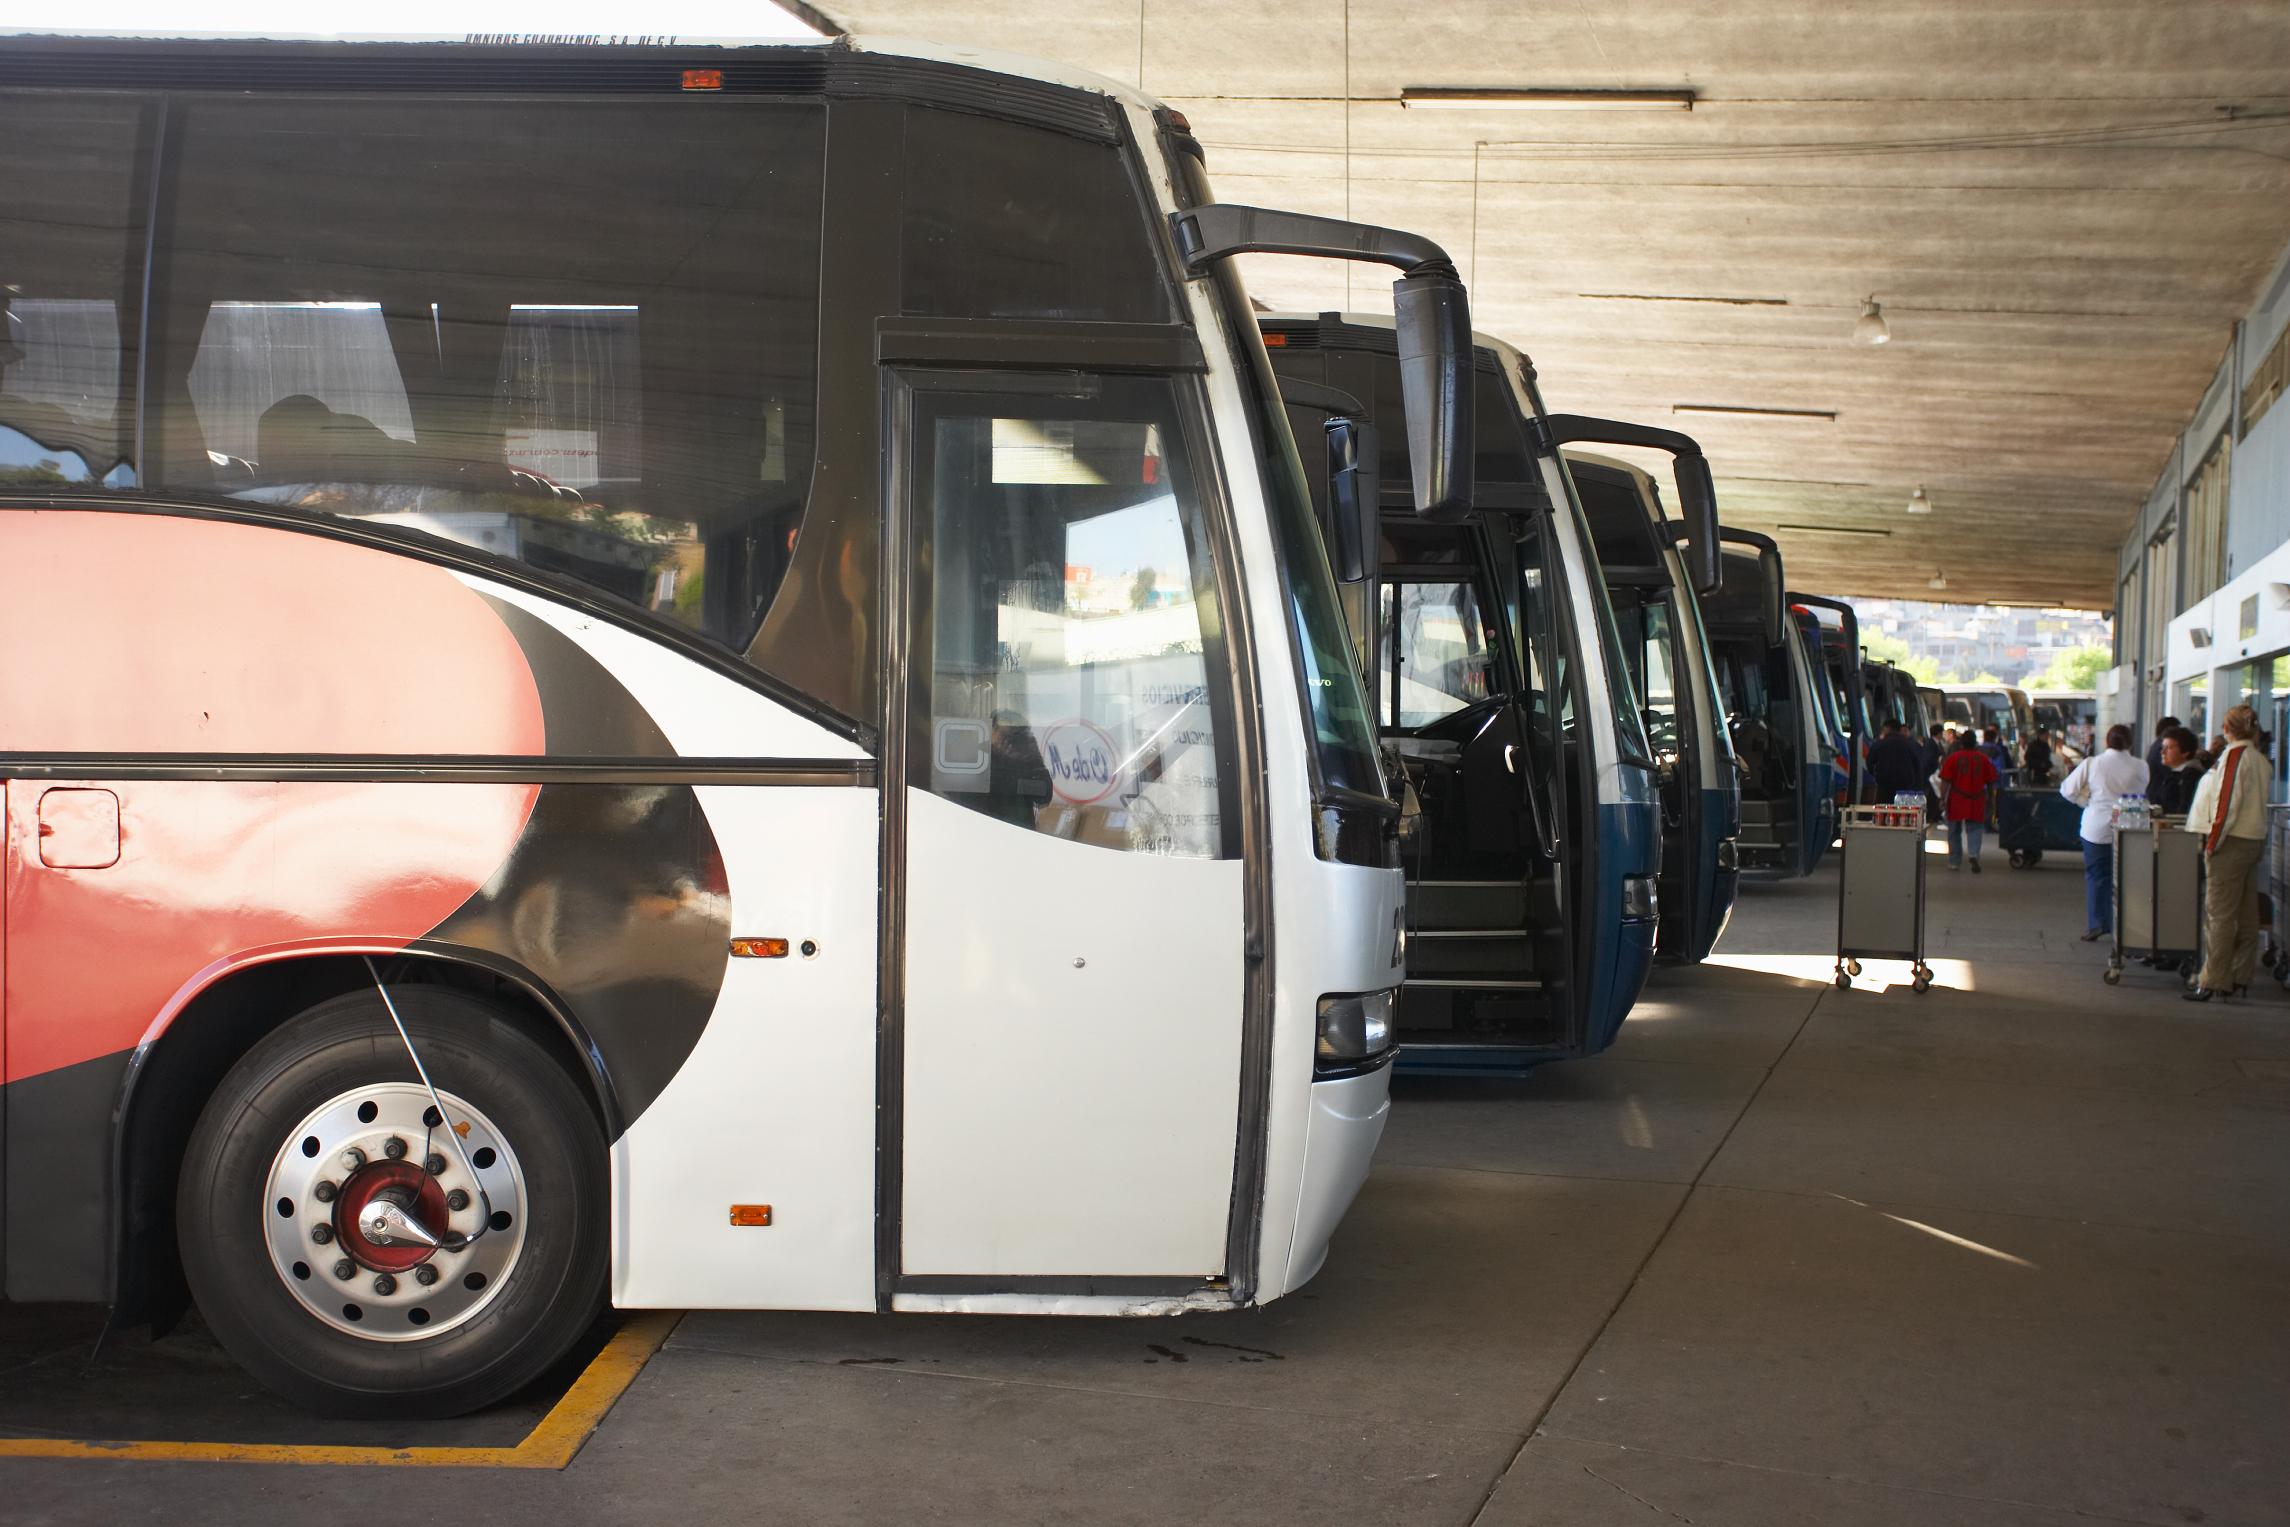 Bus Trips to New York From Scranton, Pennsylvania